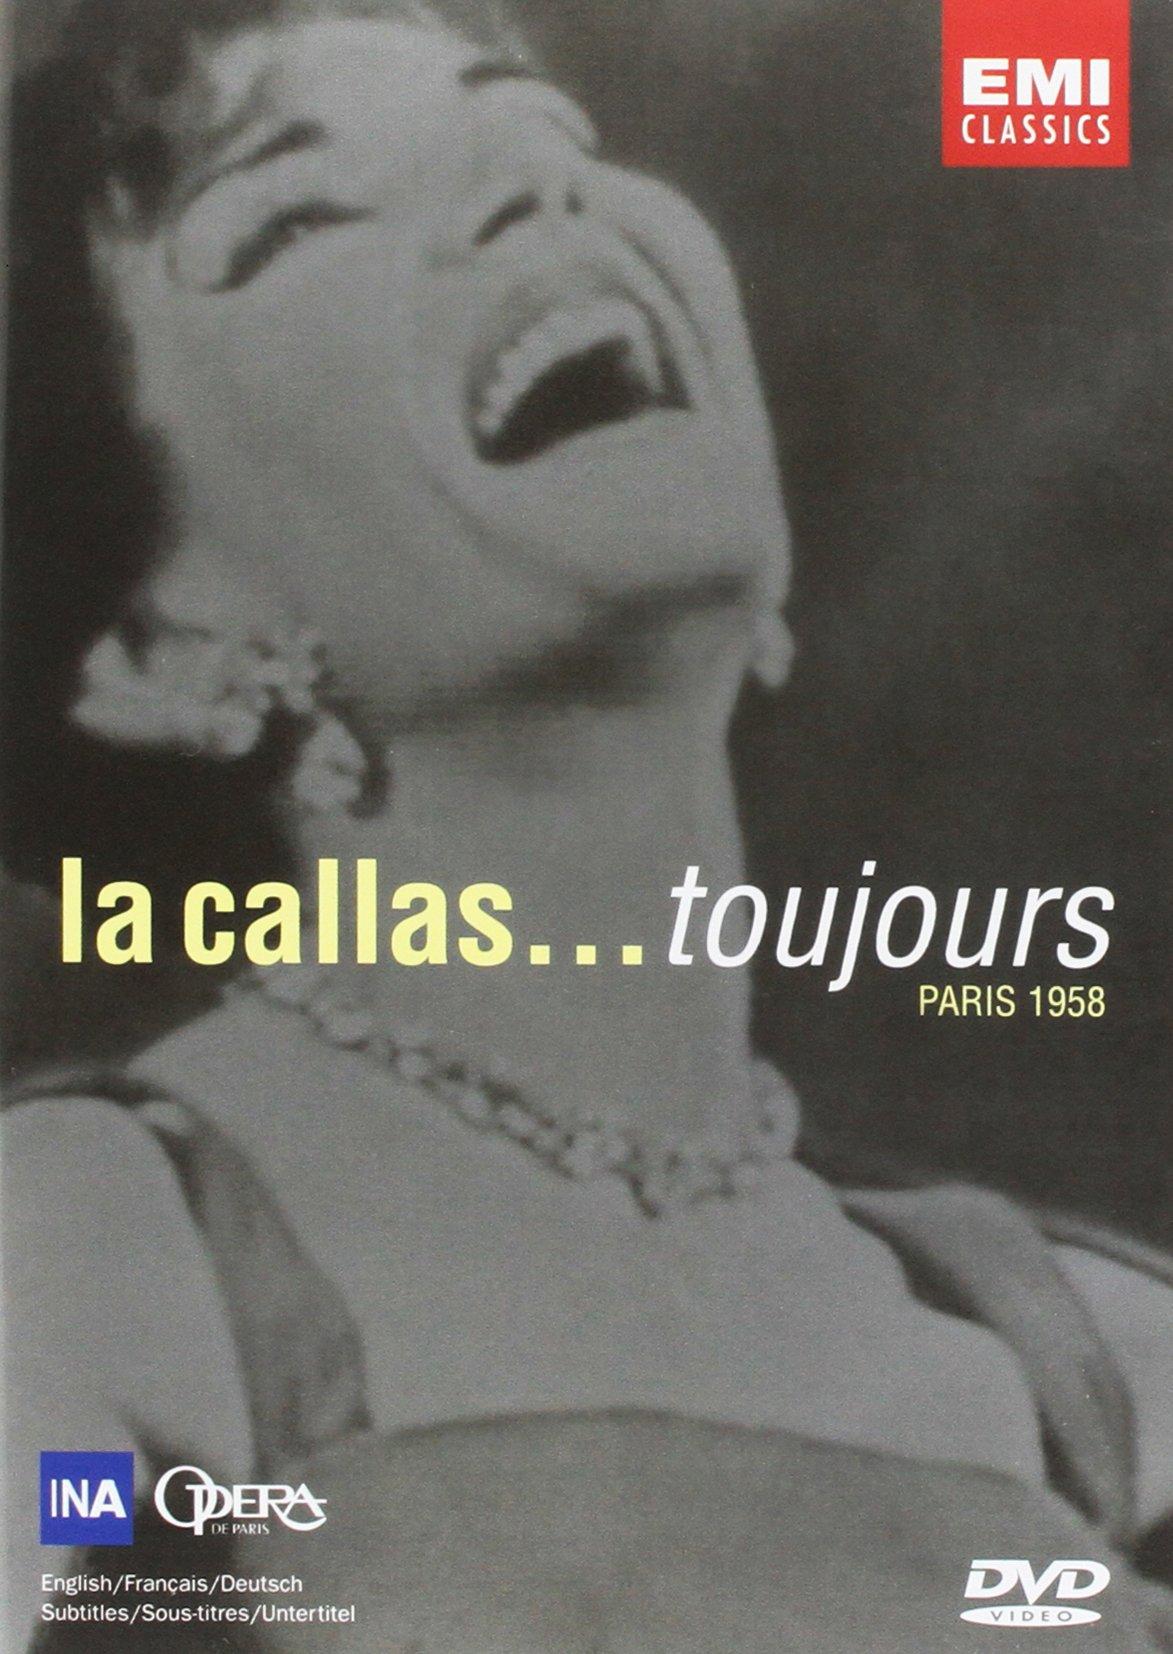 DVD : Maria Callas - Toujours Paris 1958 (DVD)